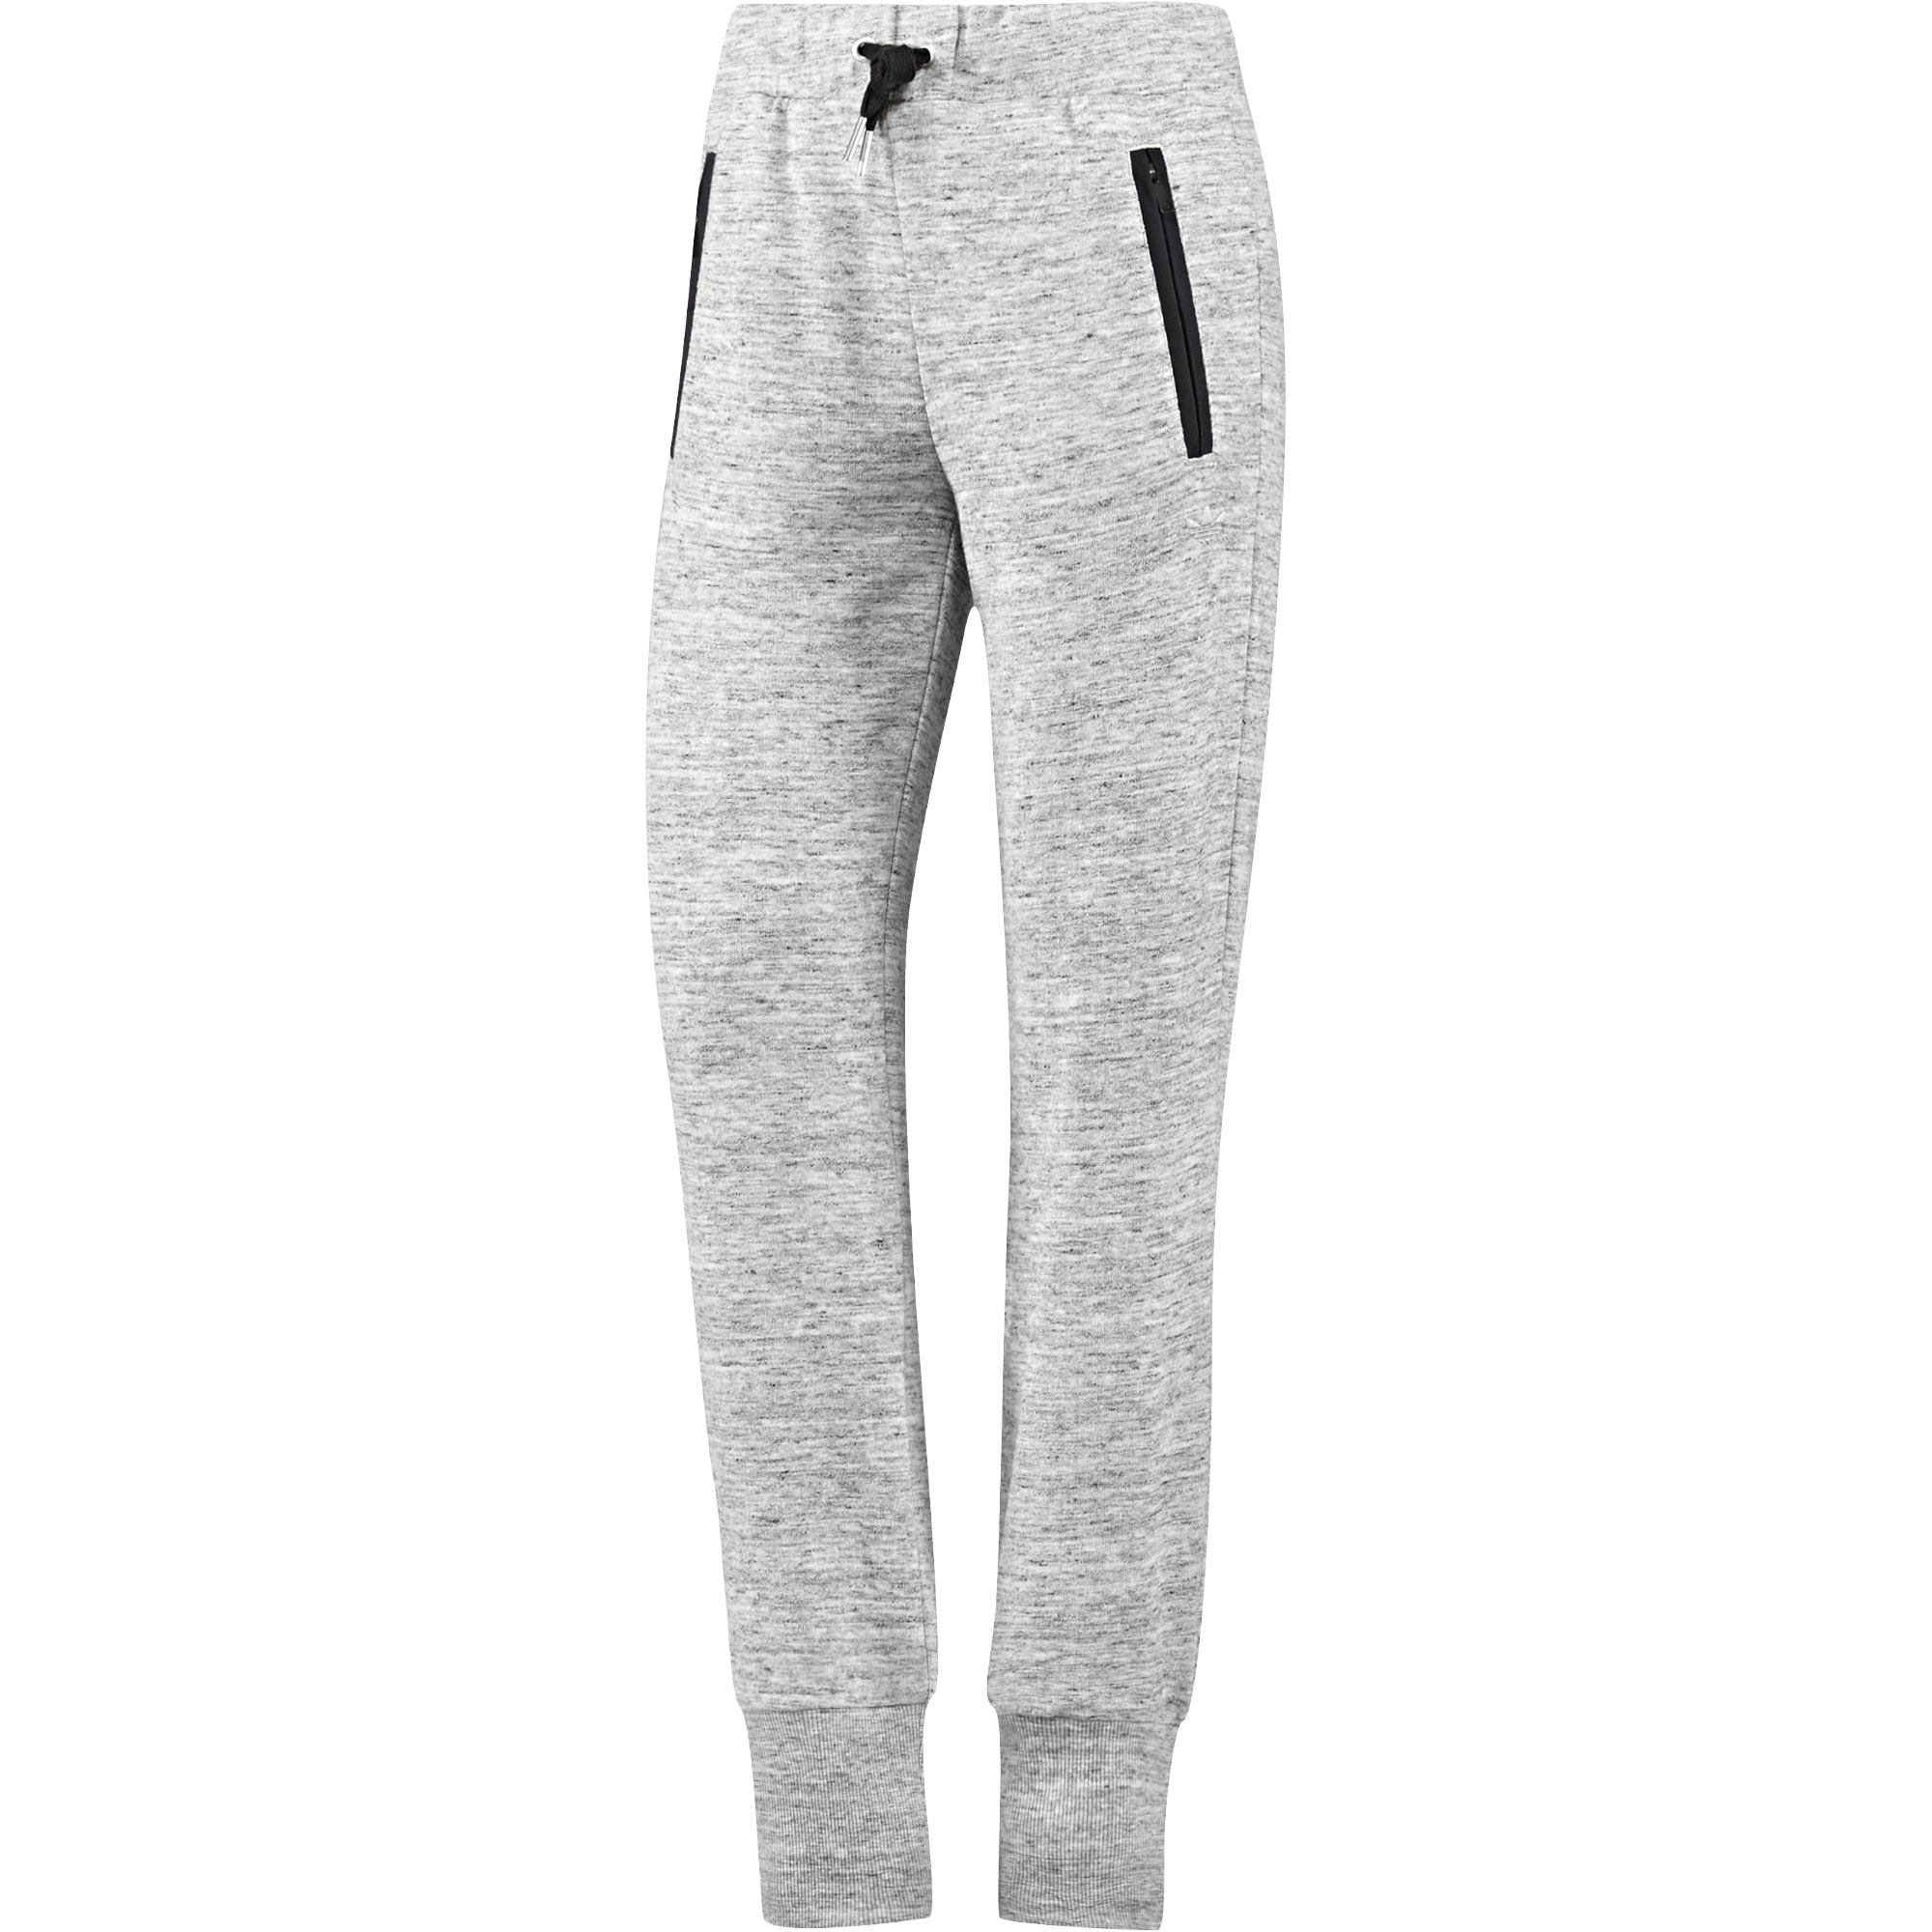 Femmes Pantalon Premium Basics Cuffed adidas | adidas France